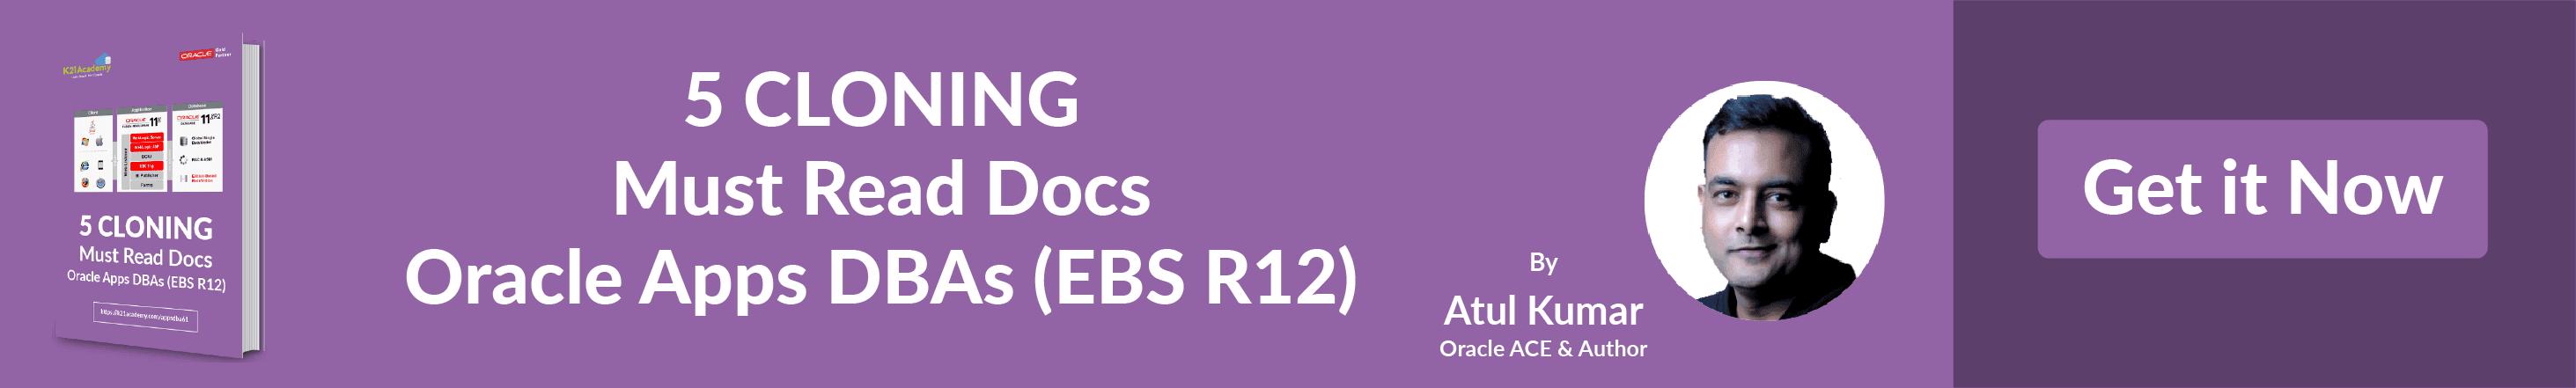 Oracle EBS (R12): 5 cloning must read docs